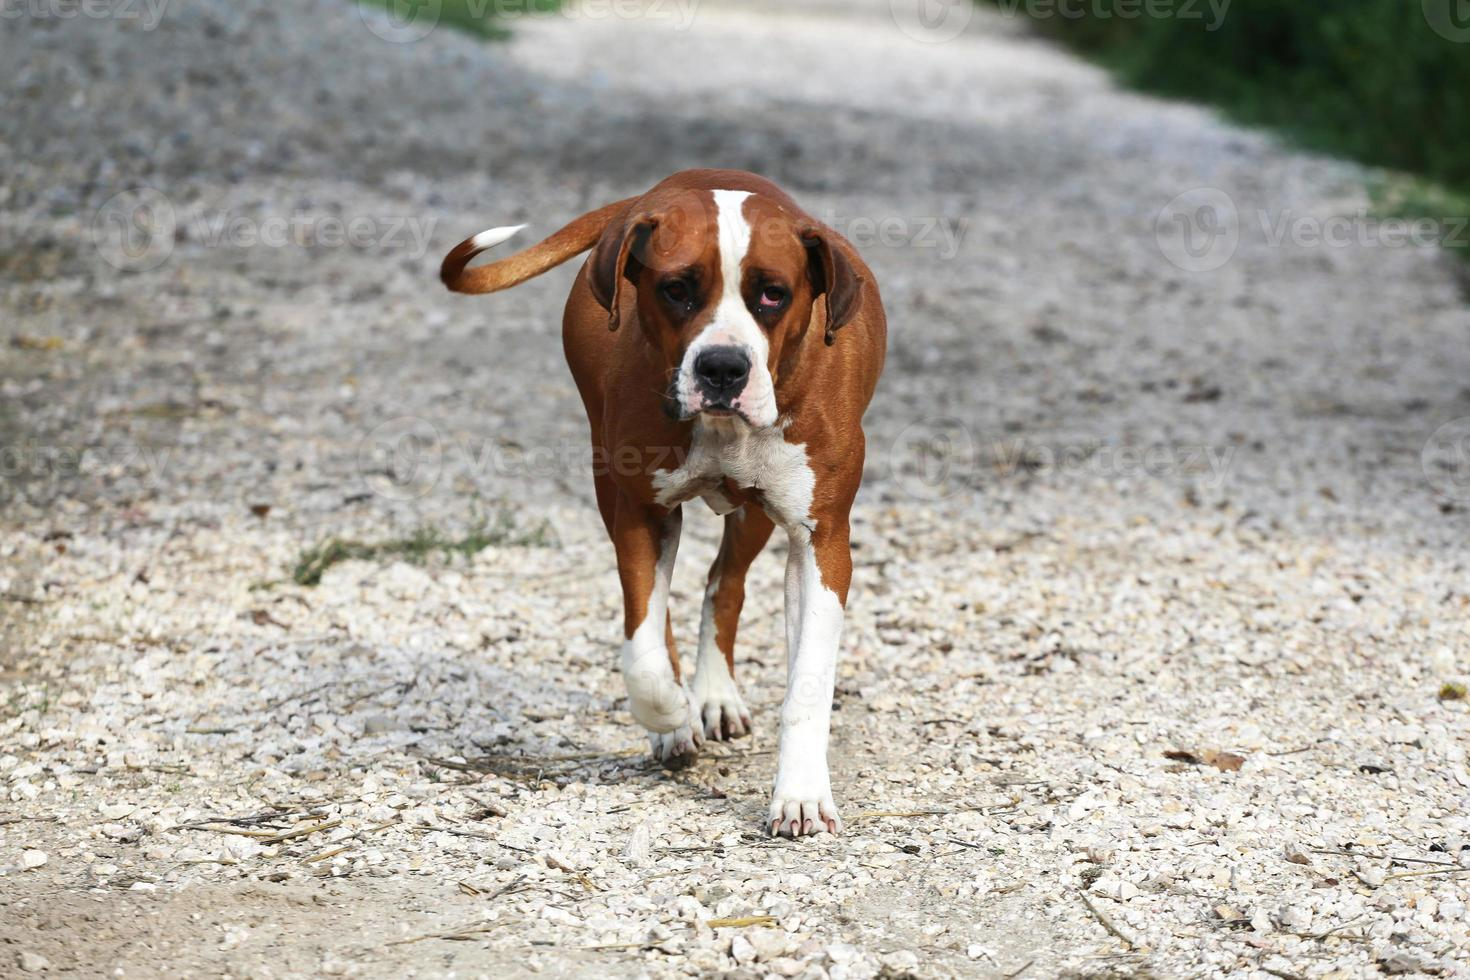 Bulldog americano hembra inteligente en una granja de animales foto